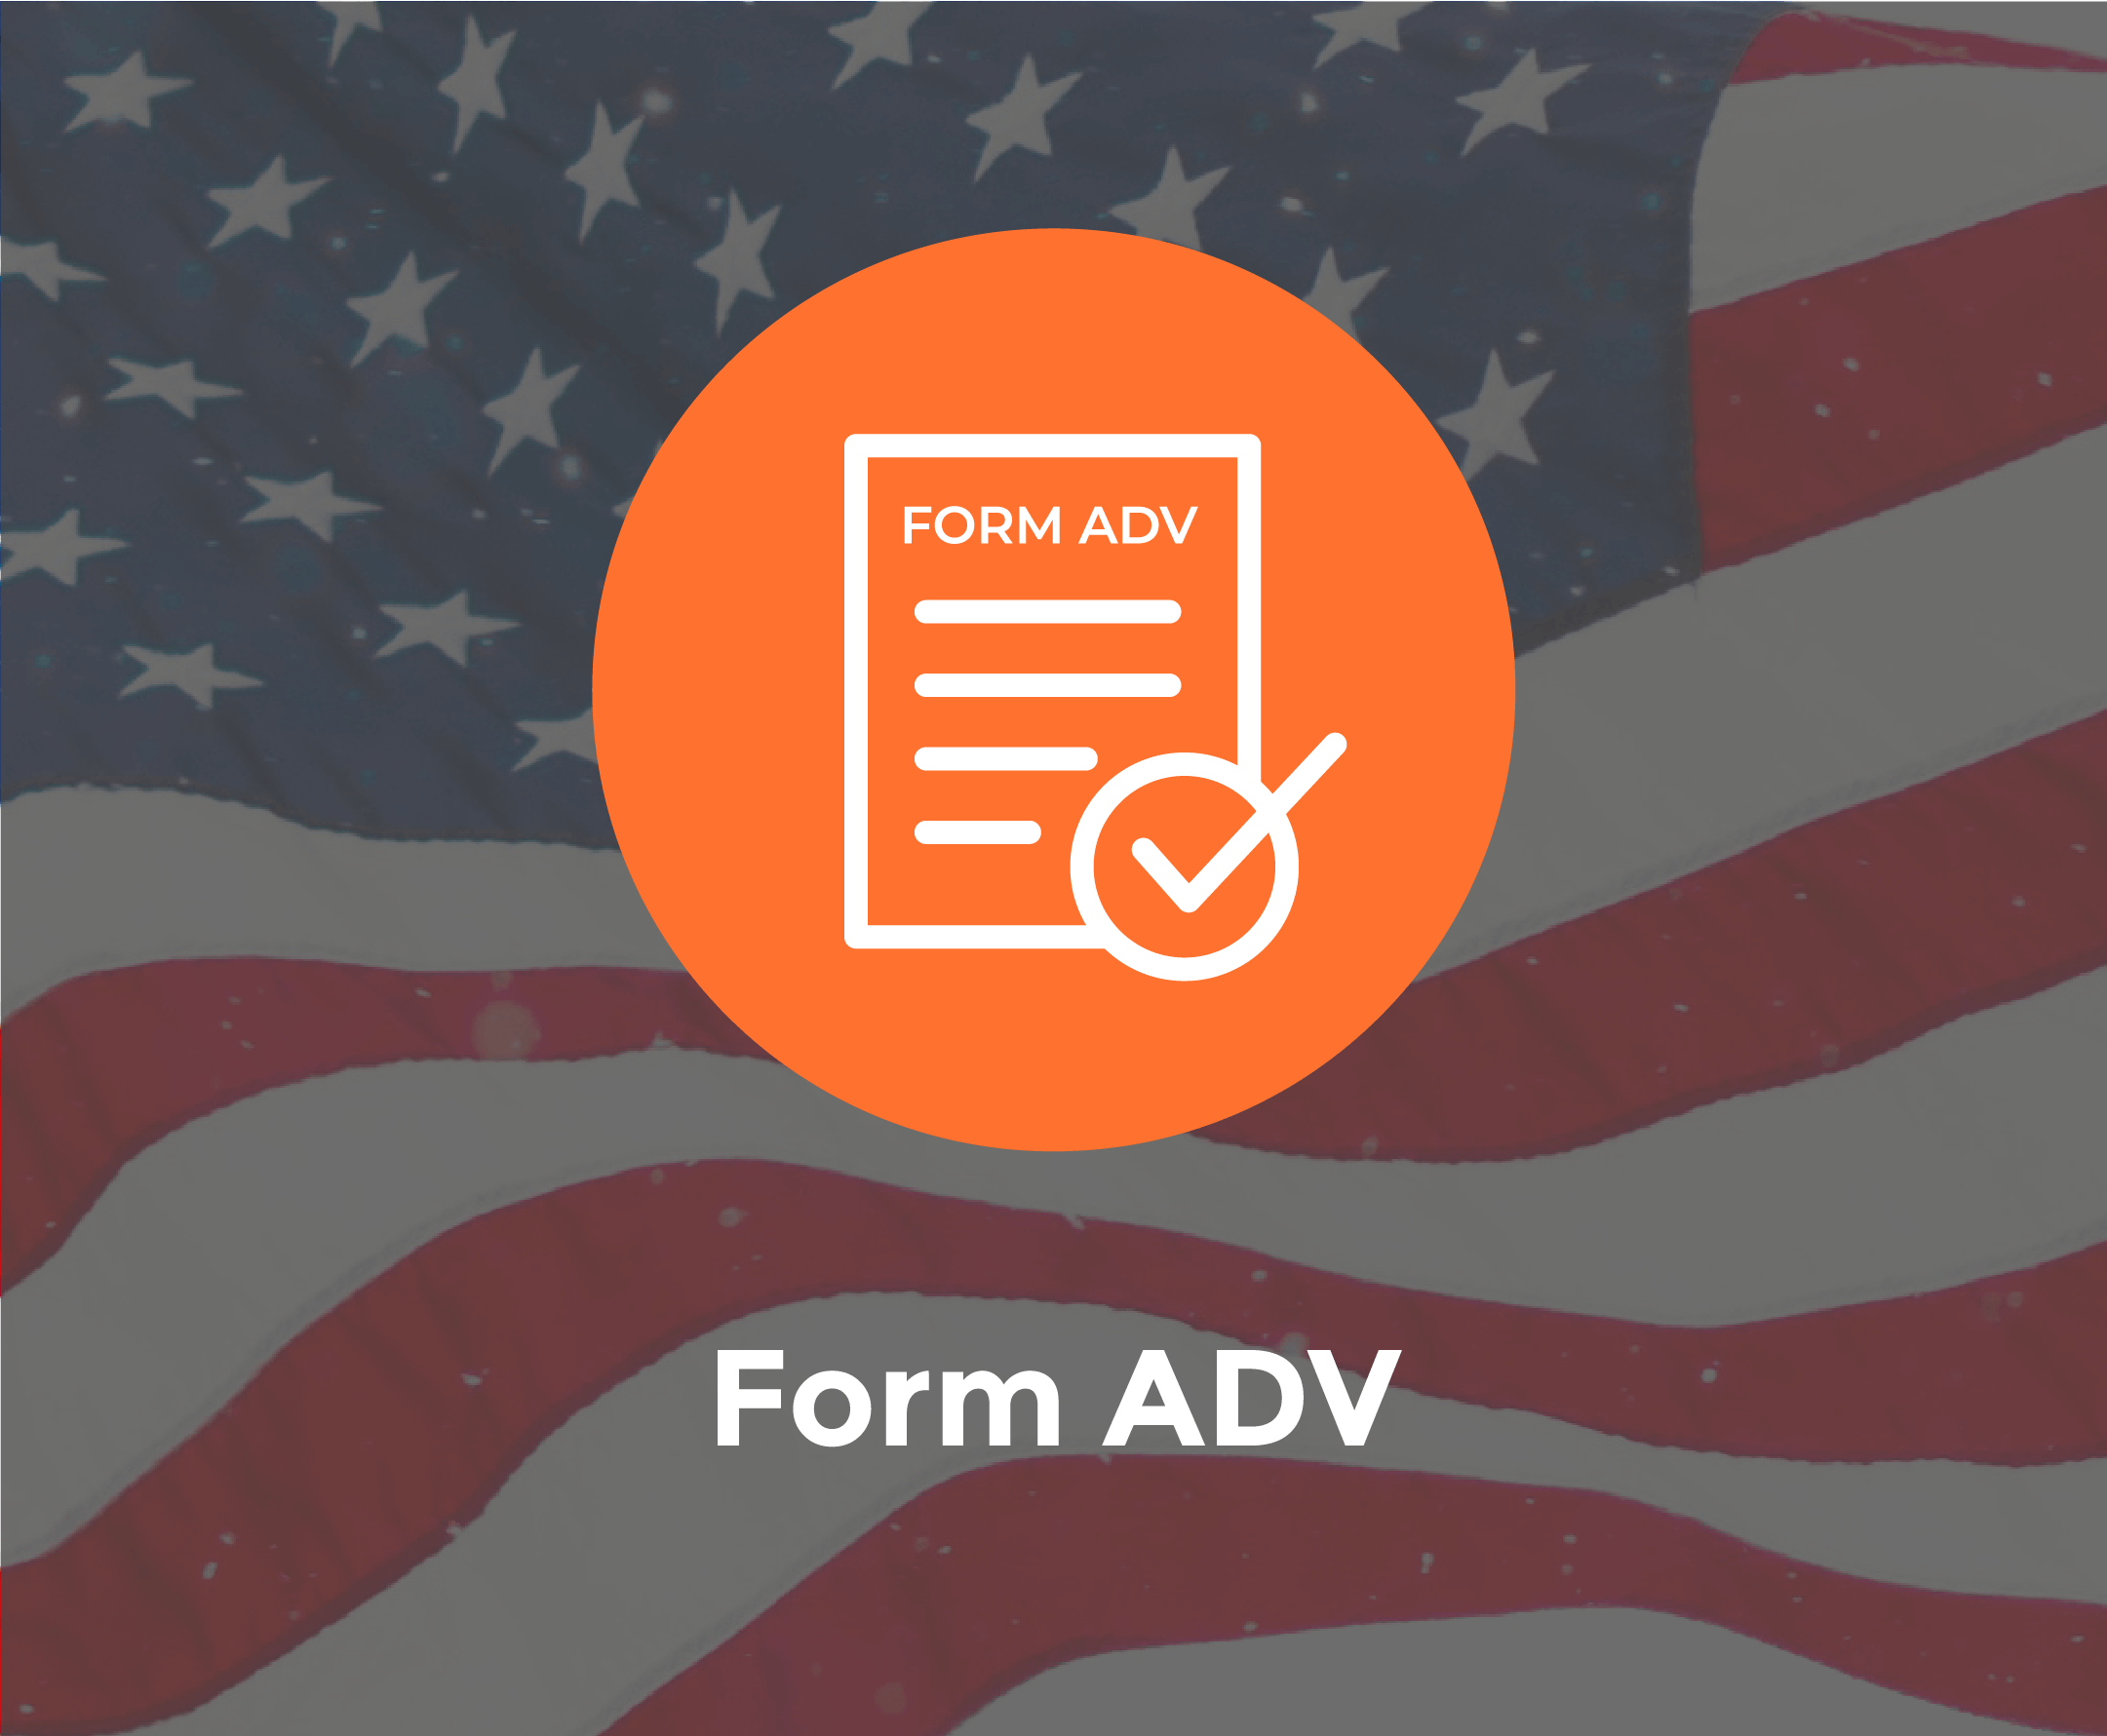 Form ADV